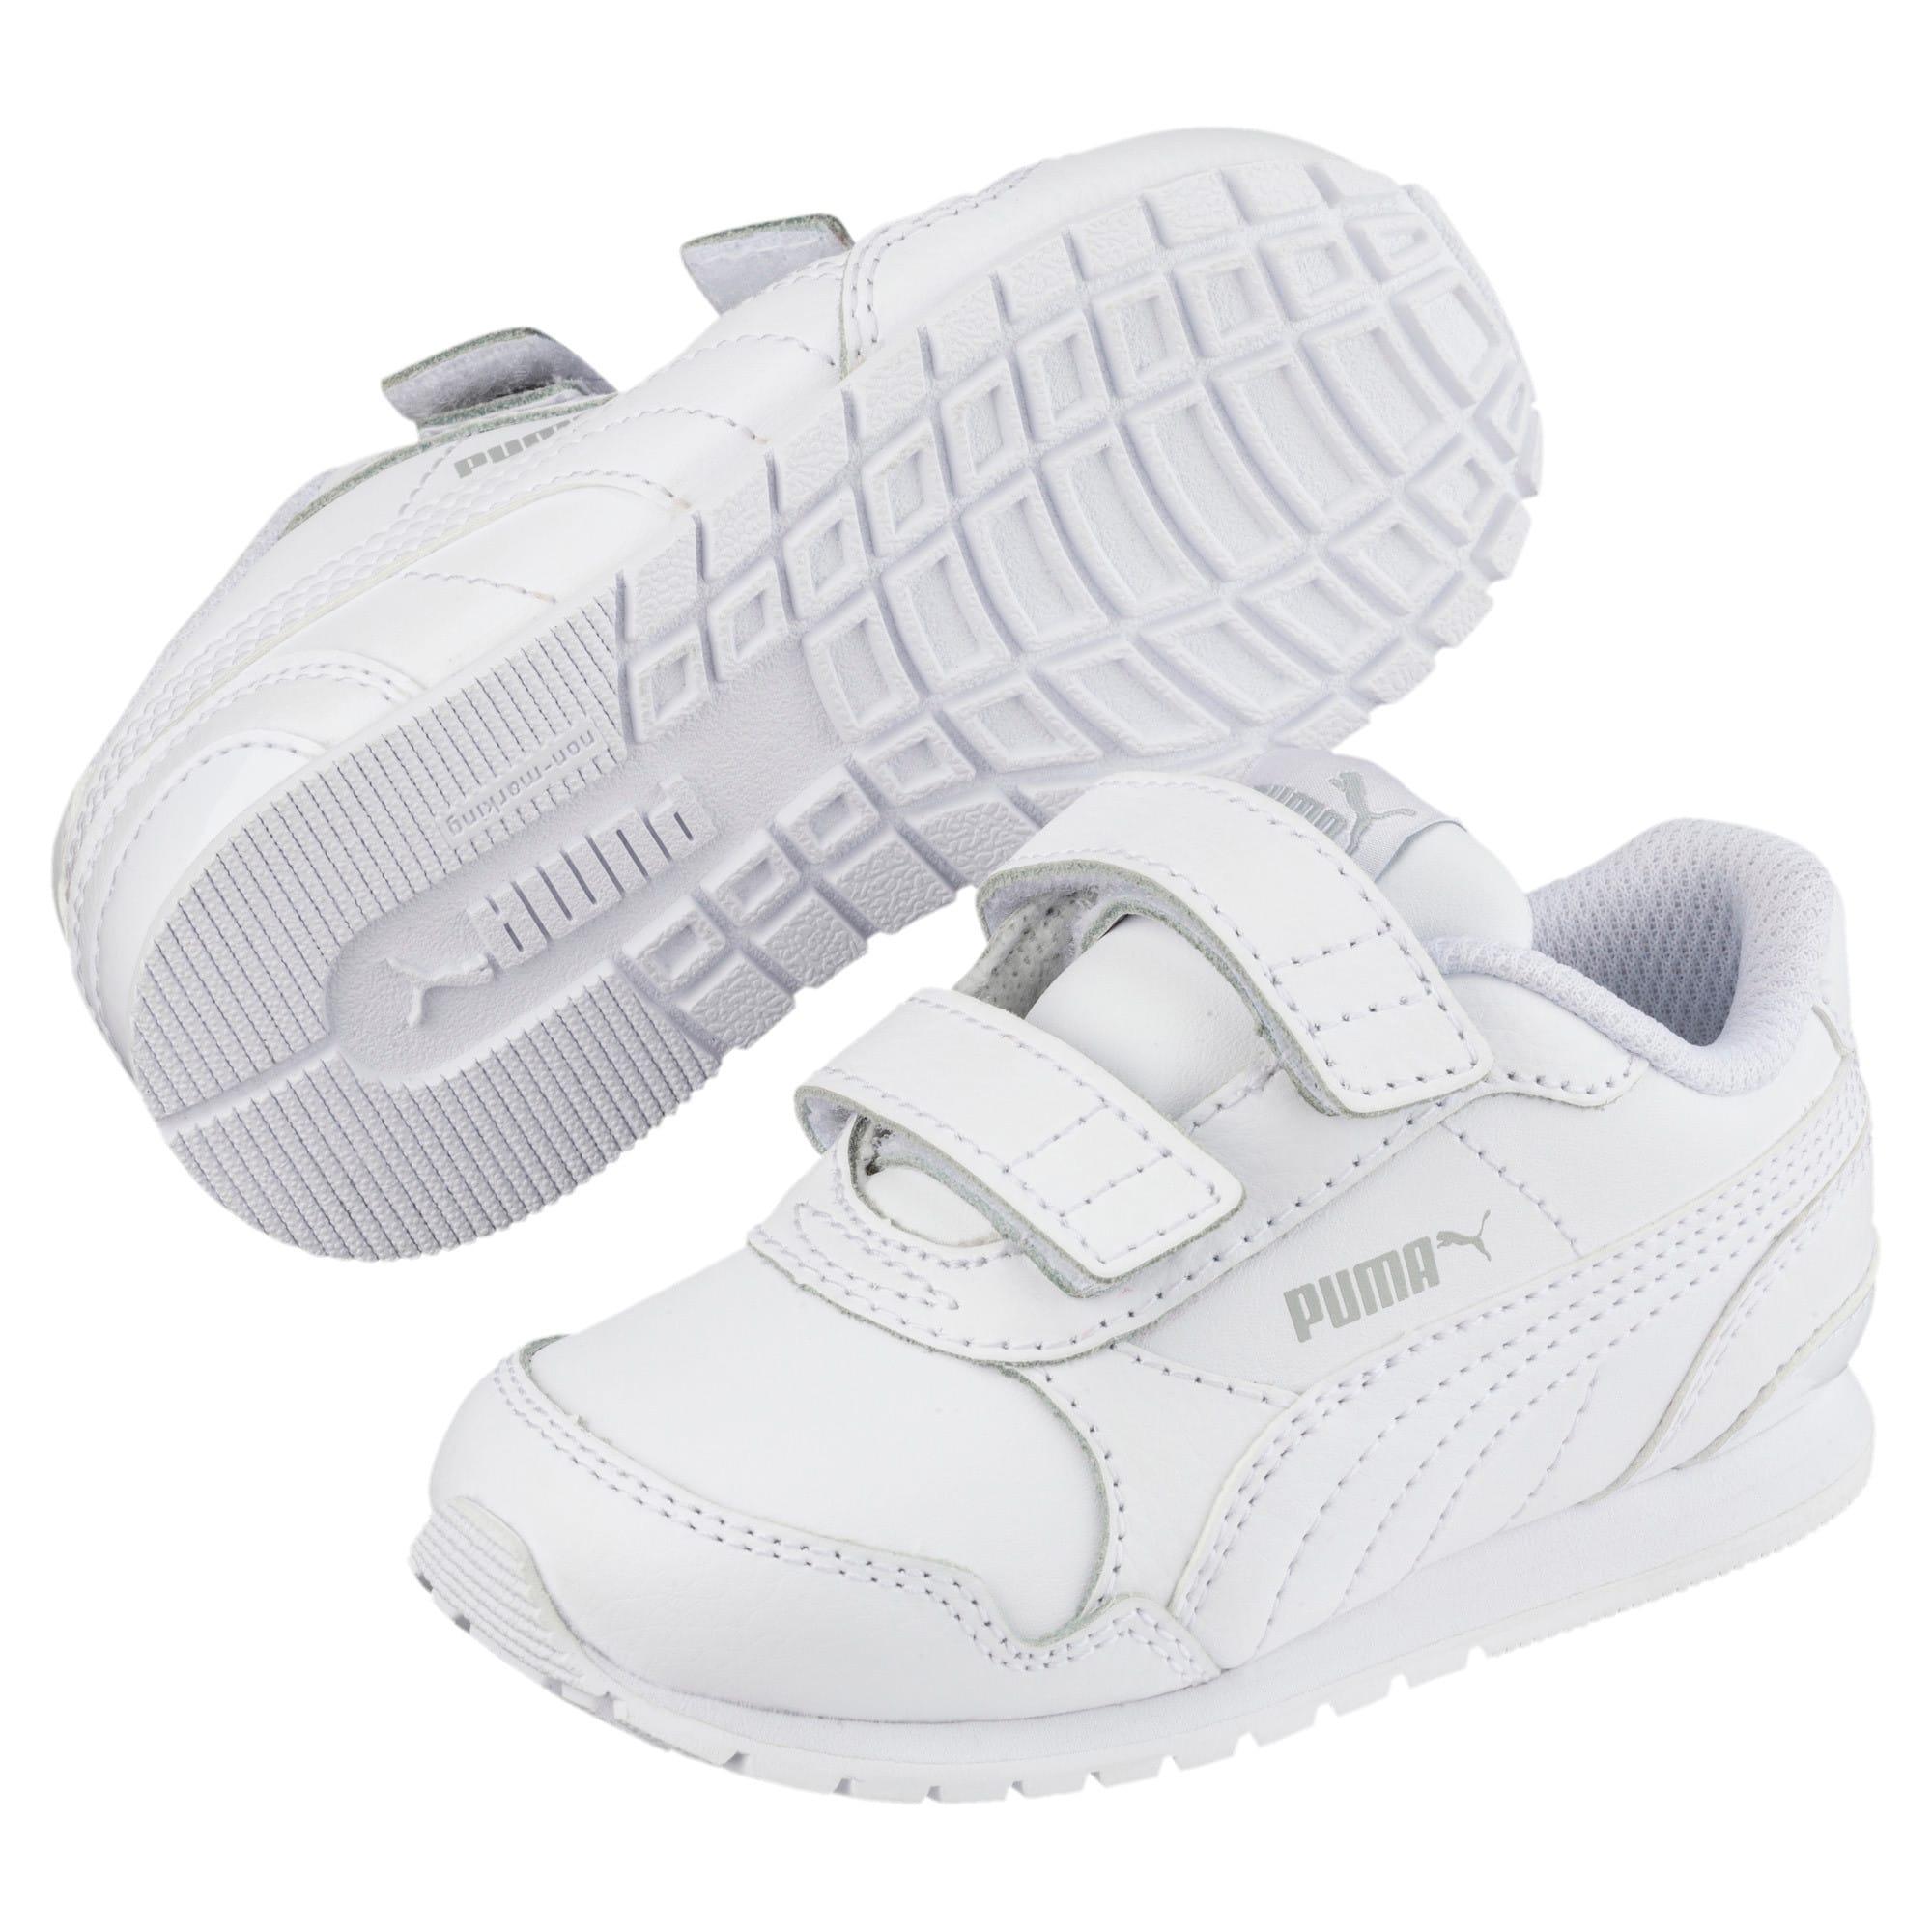 Thumbnail 1 of ST Runner v2 AC Shoes INF, Puma White-Gray Violet, medium